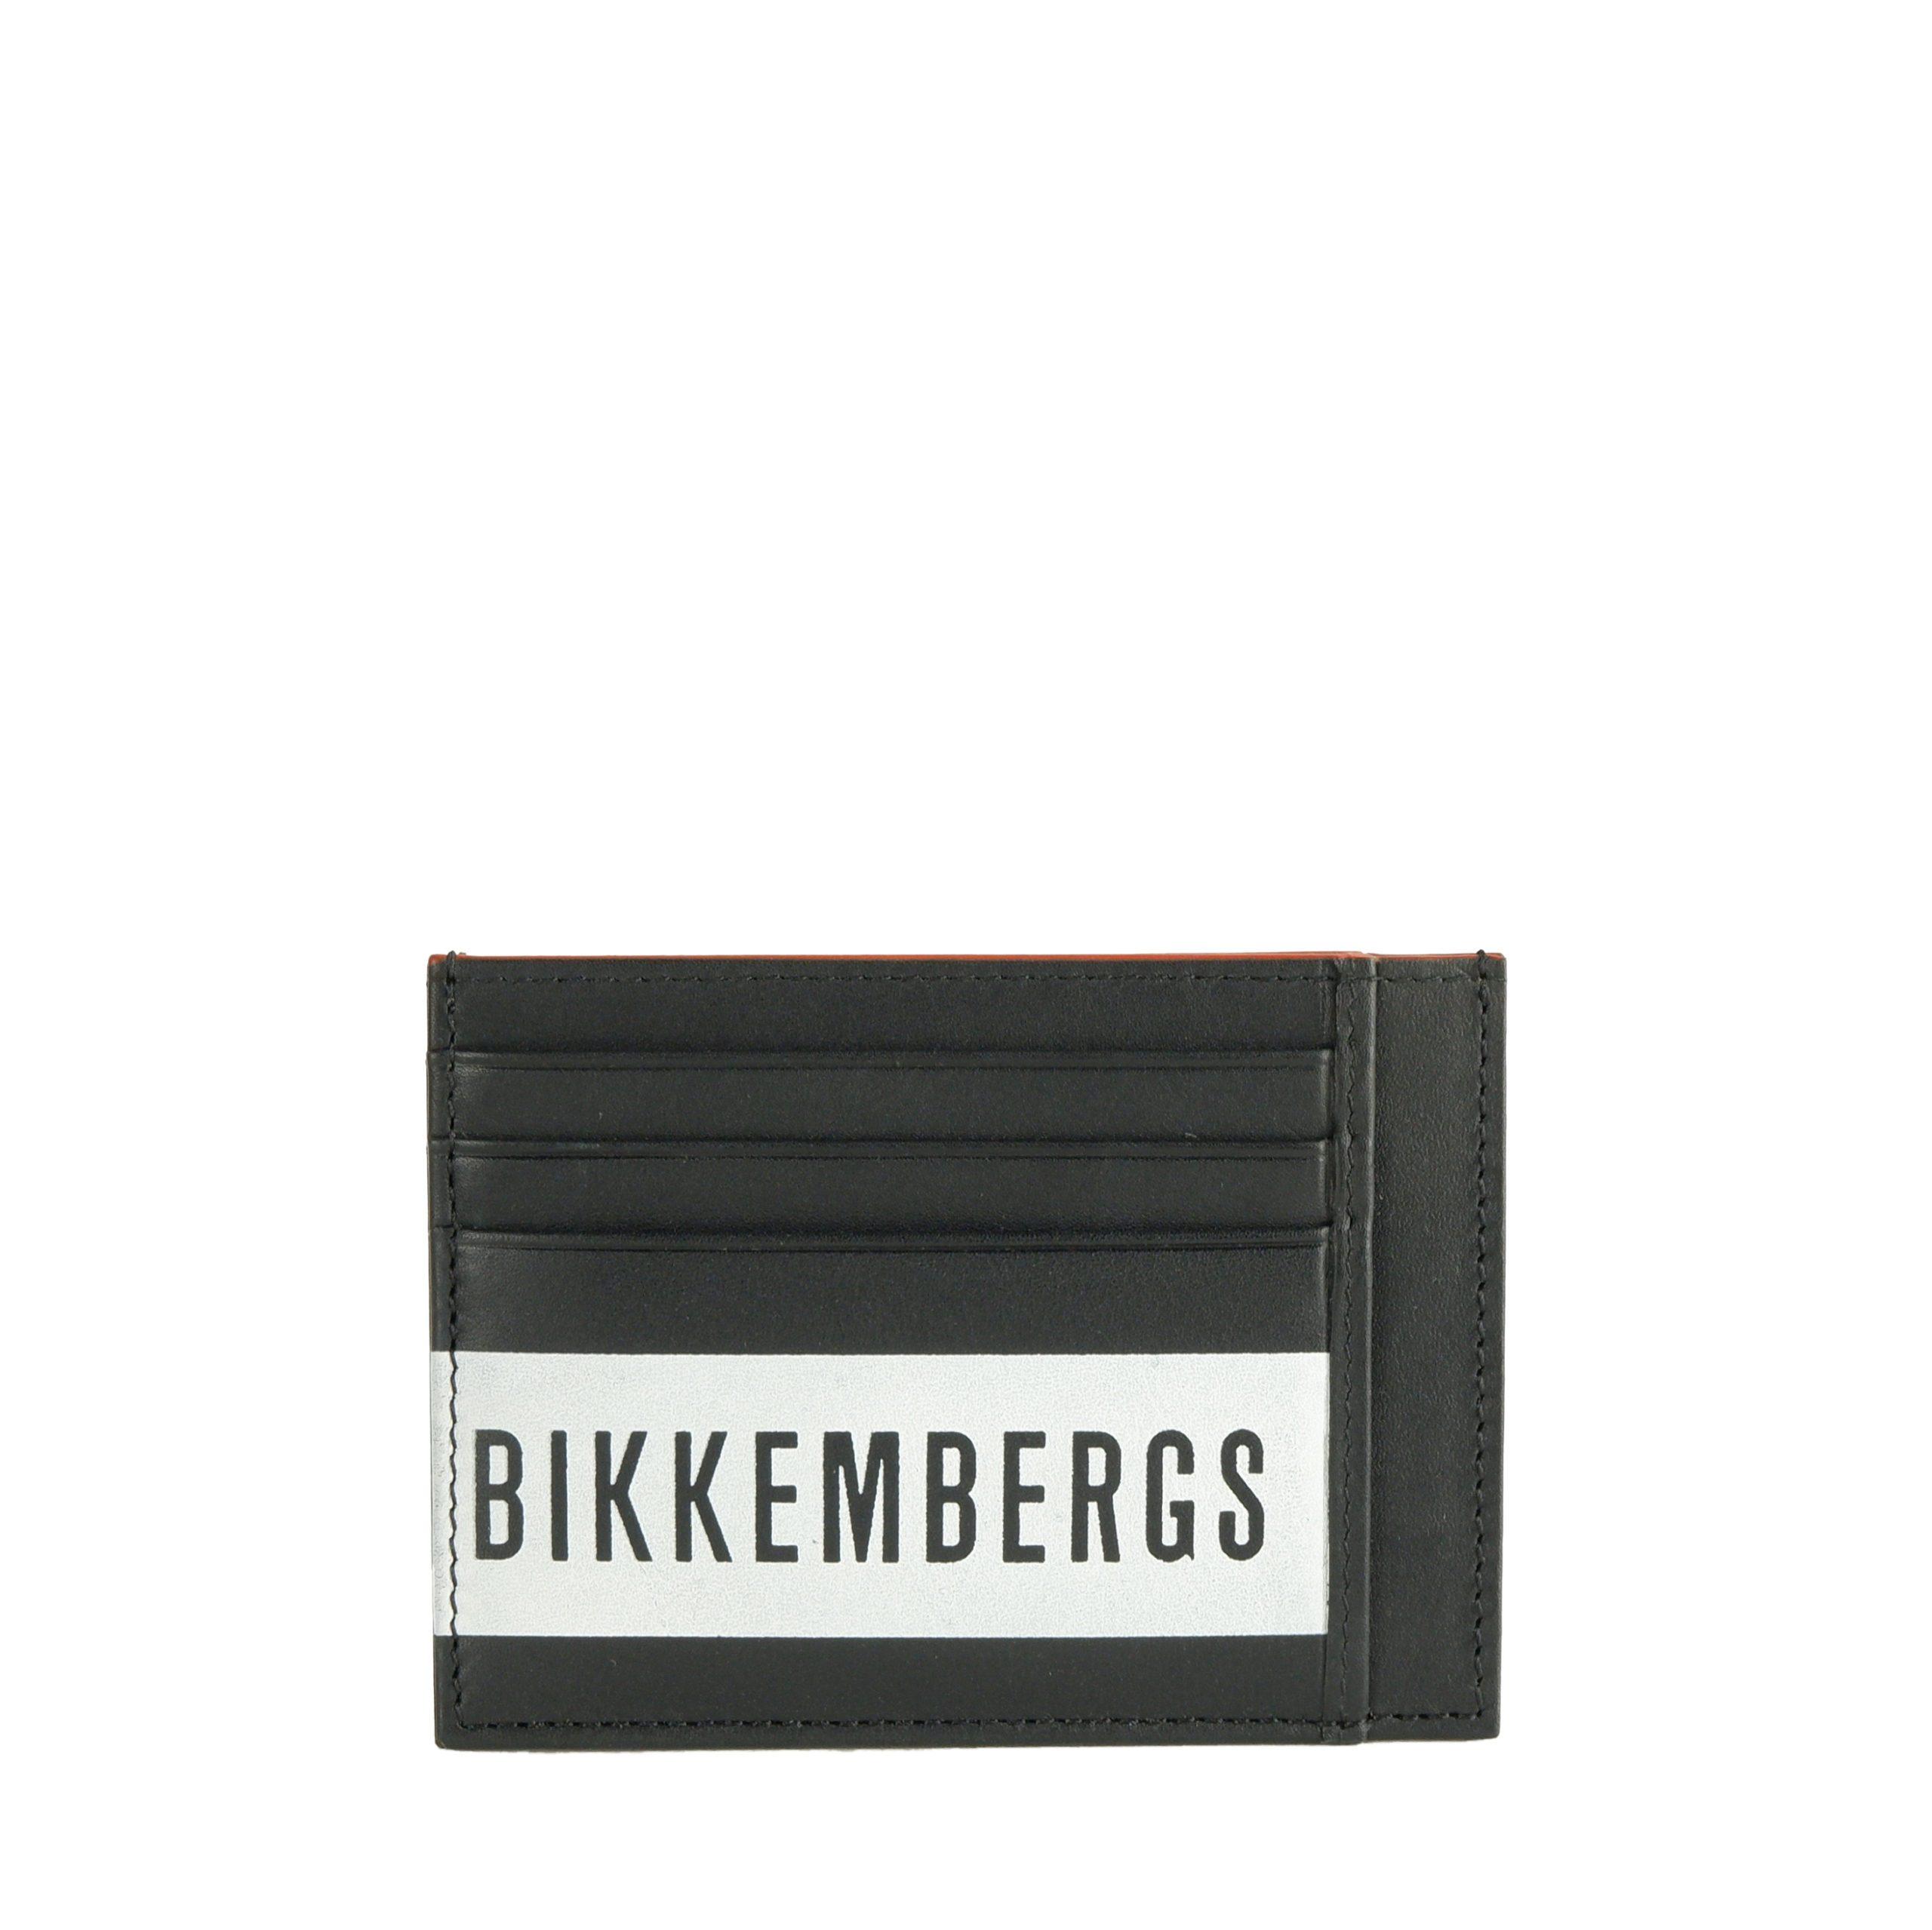 Bikkembergs Men's Wallet Black BI1432560